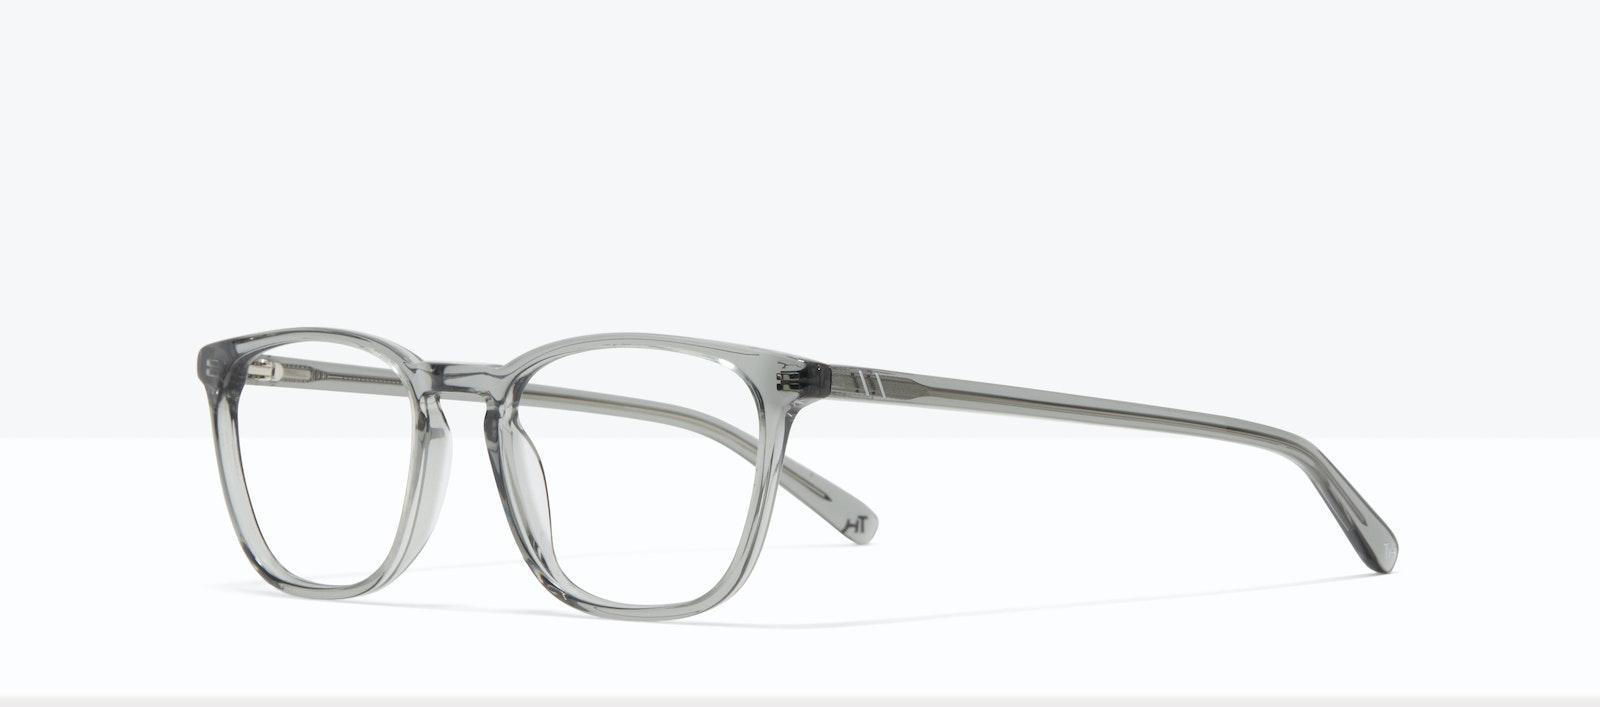 Affordable Fashion Glasses Square Eyeglasses Men Louise XL Storm Tilt